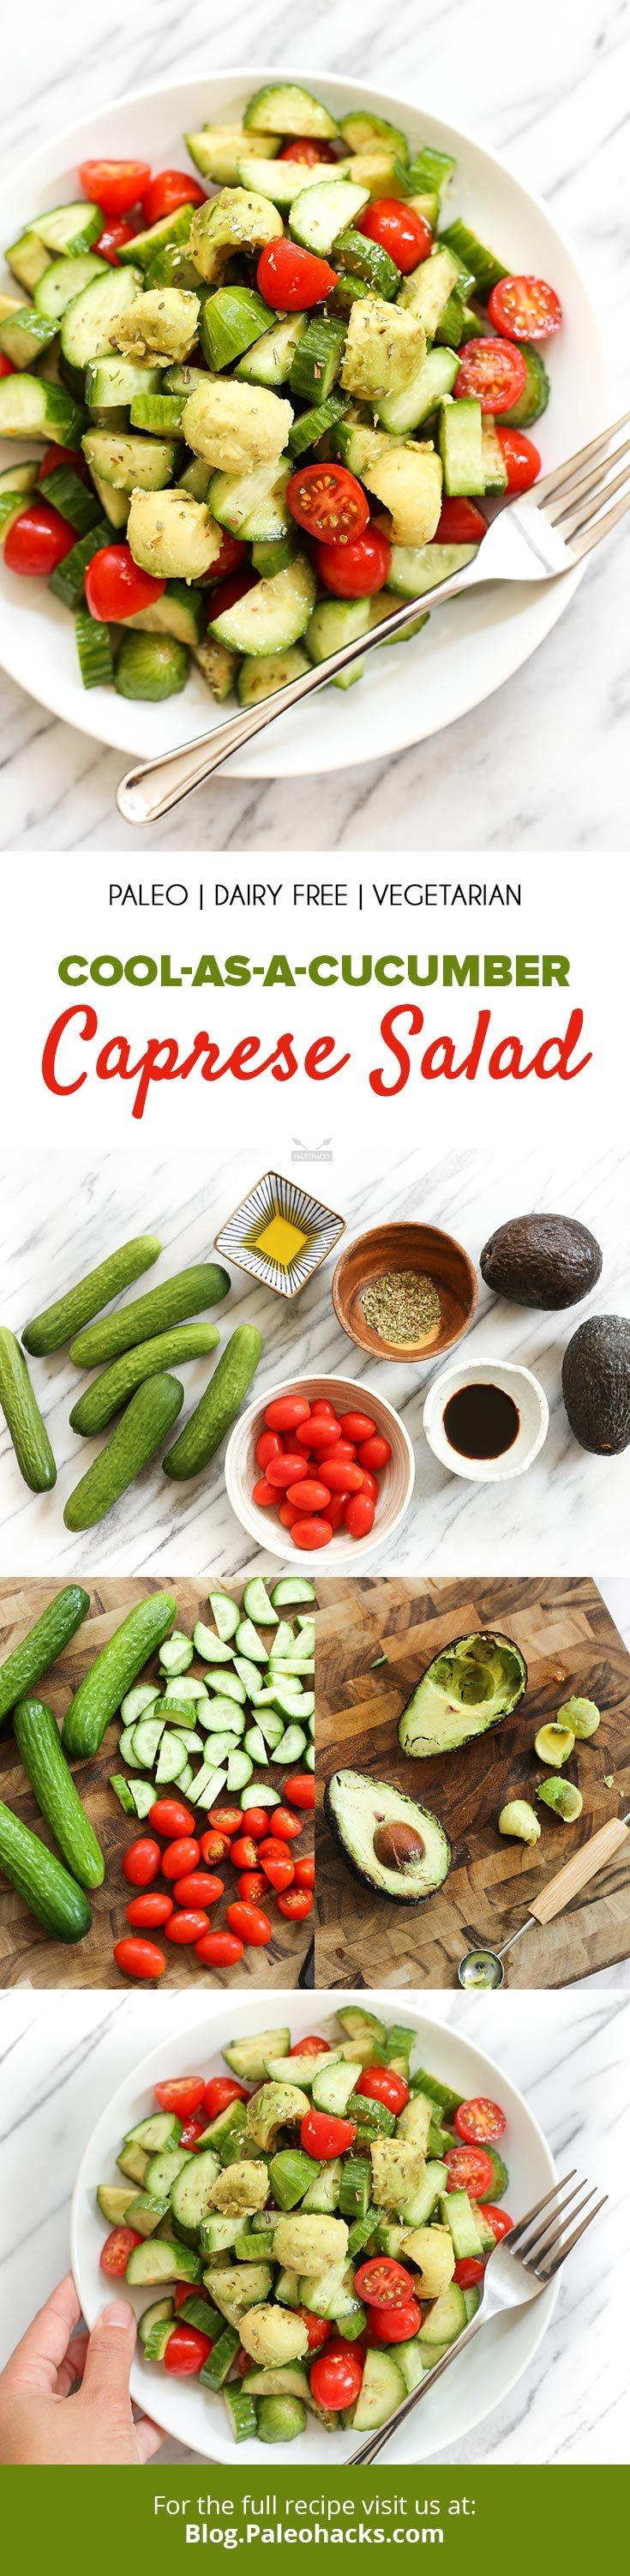 PIN-Cool-as-a-Cucumber-Caprese-Salad.jpg